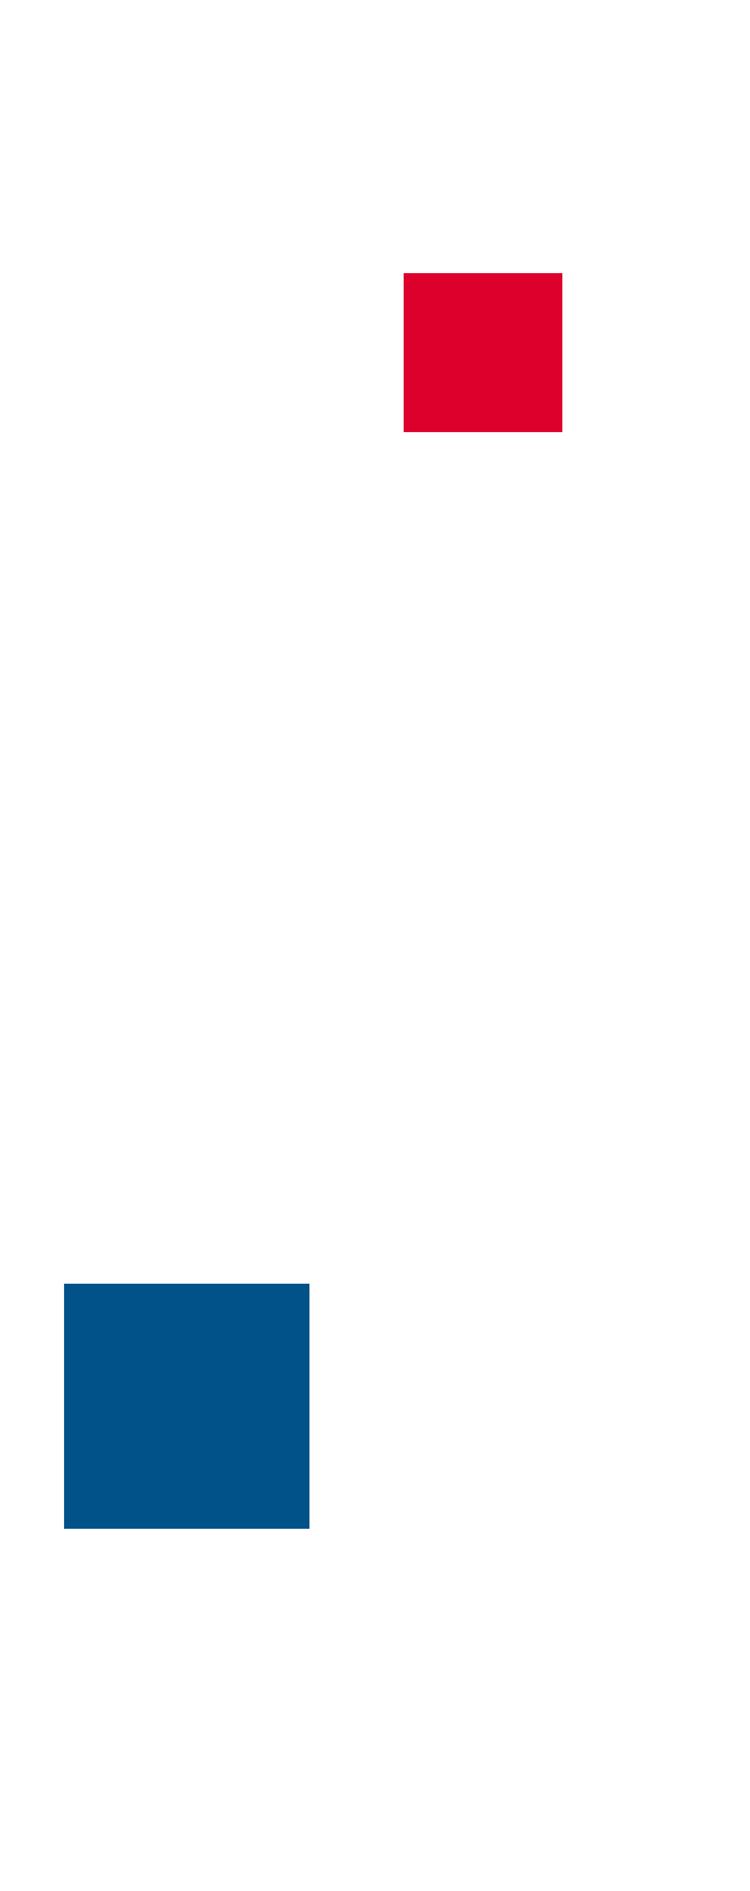 circles-background-tablet-transparant-robert-administratie-financiele-dienstverlening-2